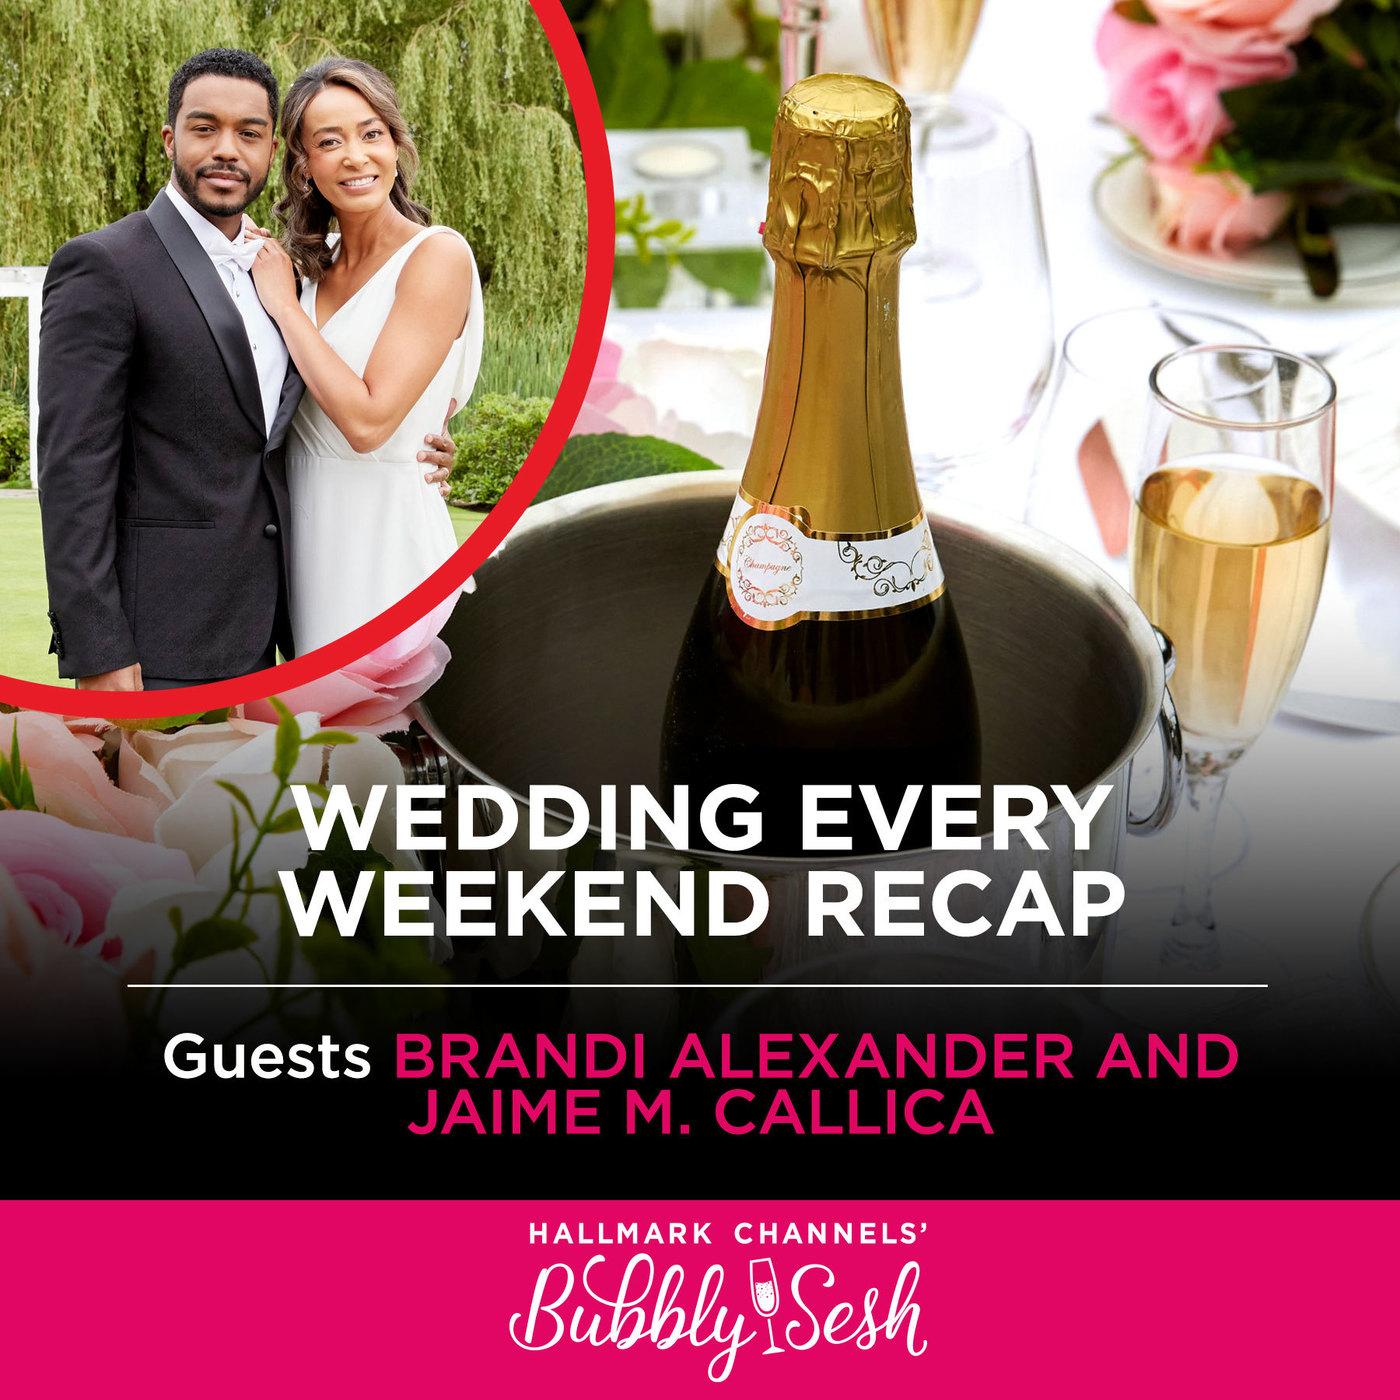 Wedding Every Weekend Recap with Guests Brandi Alexander and Jaime M. Callica